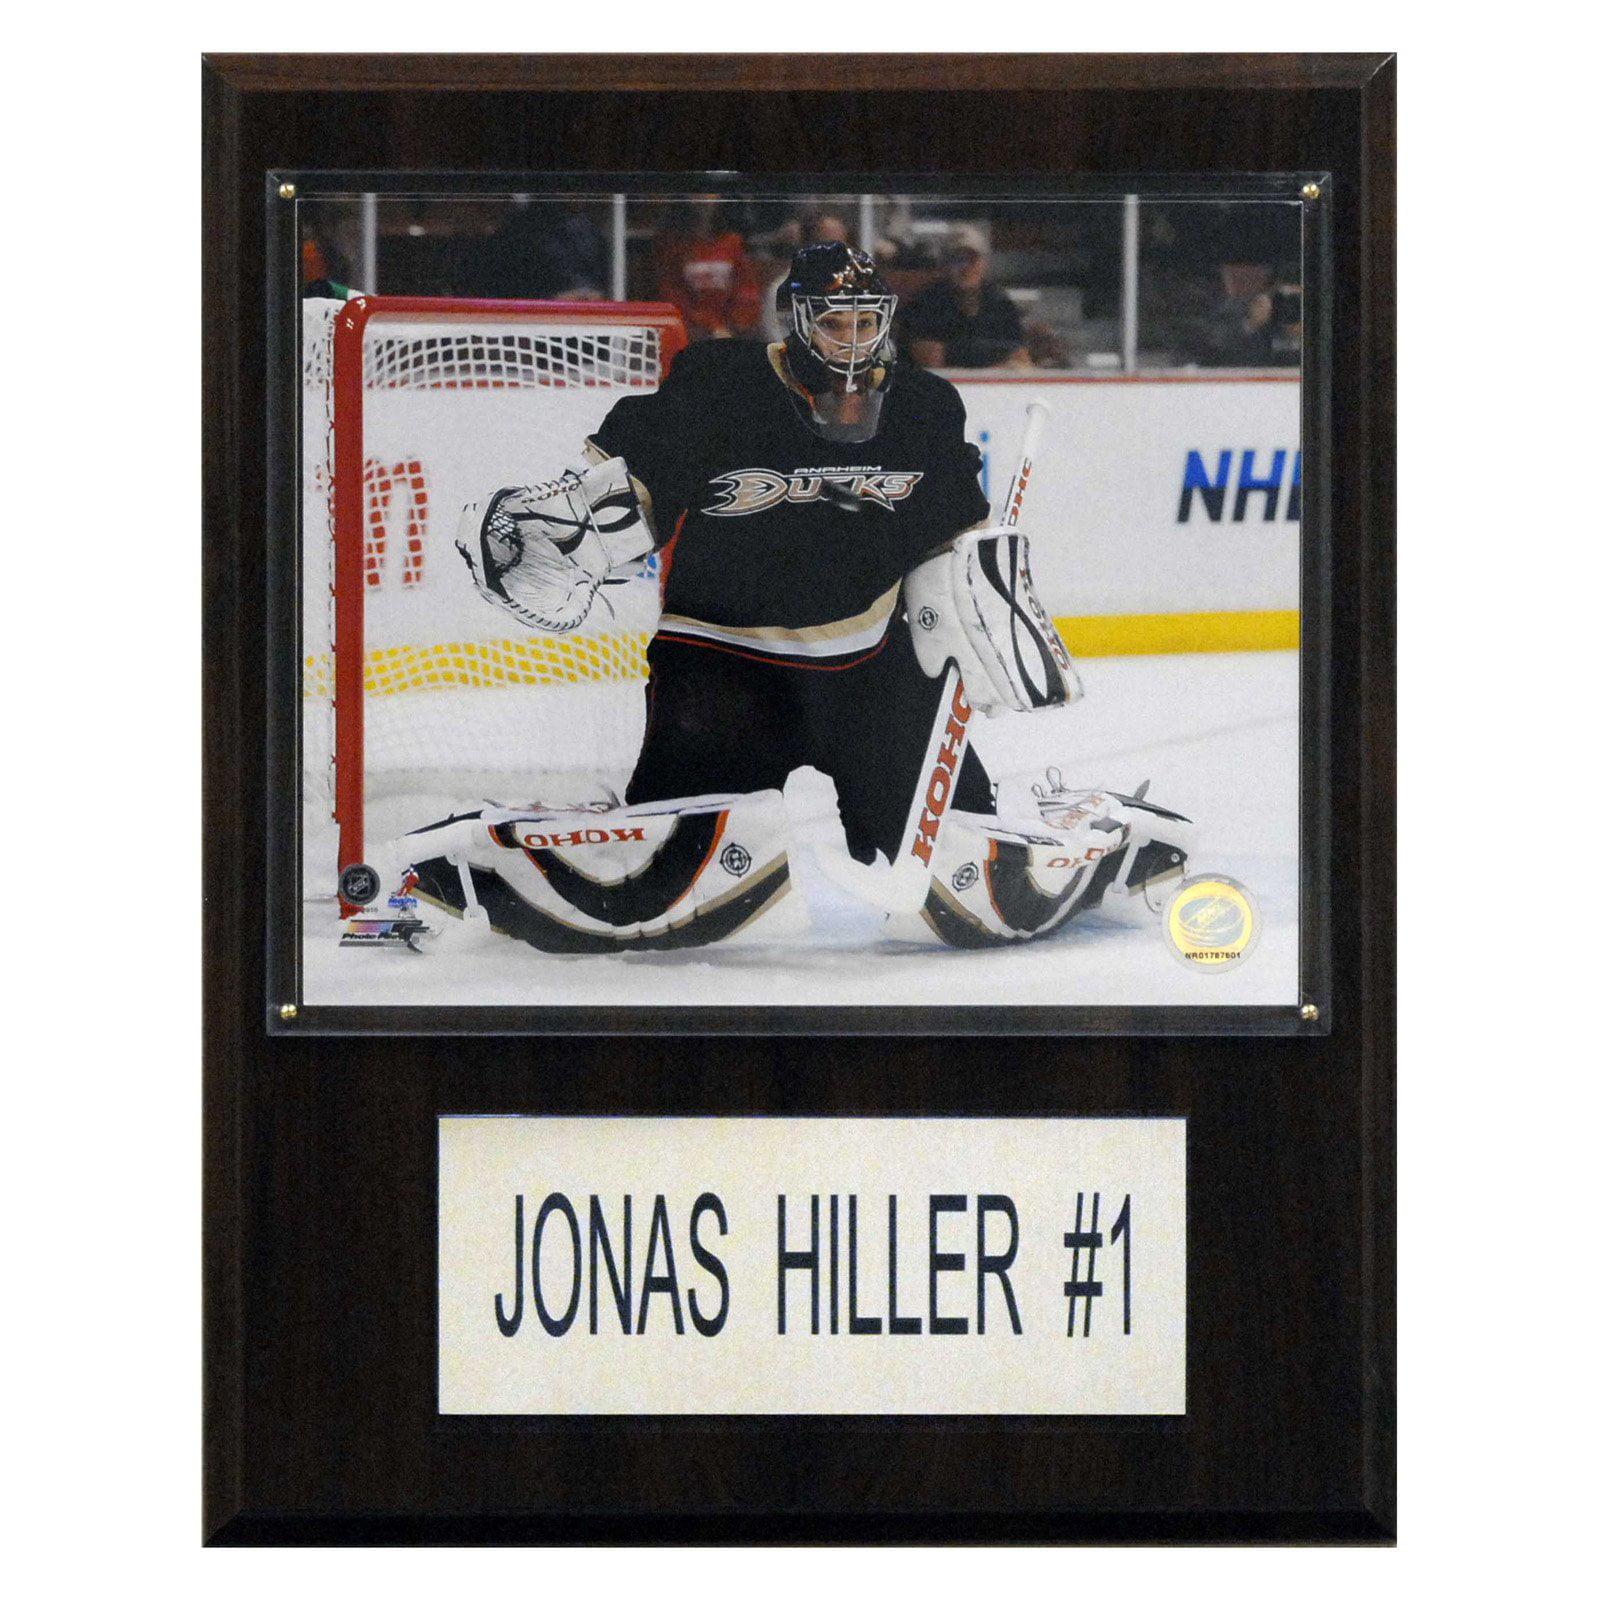 C&I Collectables NHL 12x15 Jonas Hiller Anaheim Ducks Player Plaque